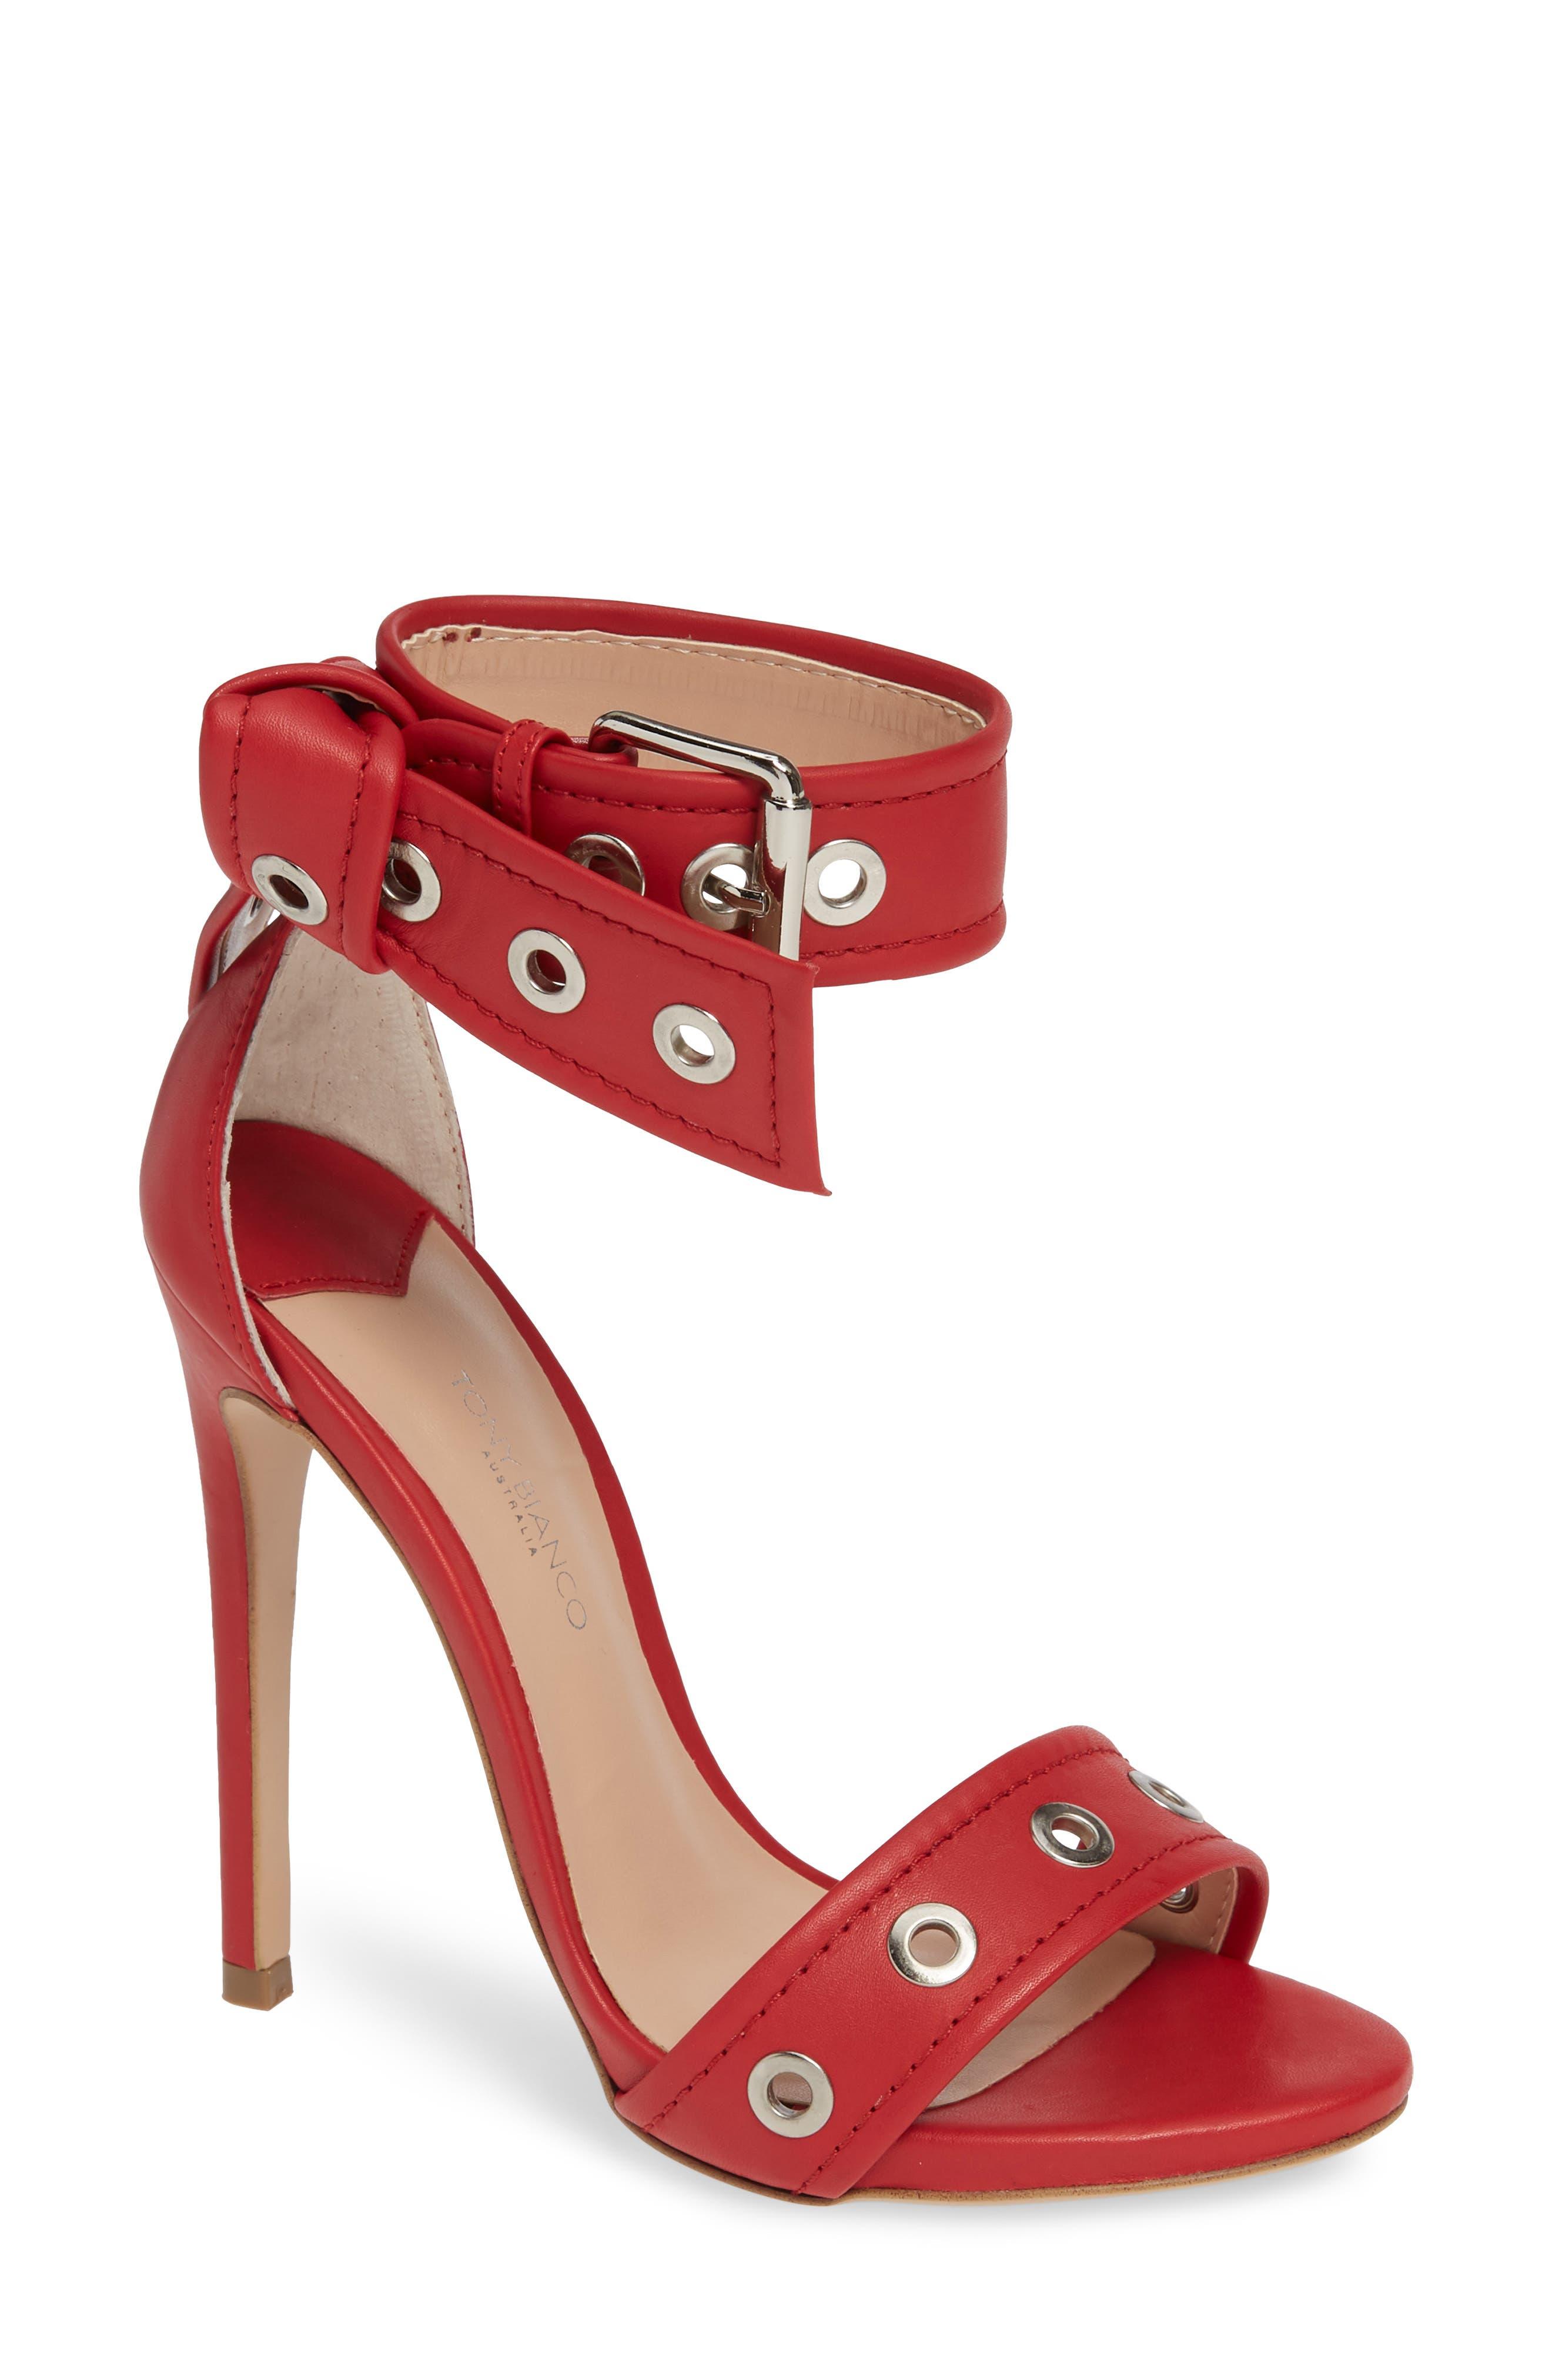 Tony Bianco Acadia Sandal- Red